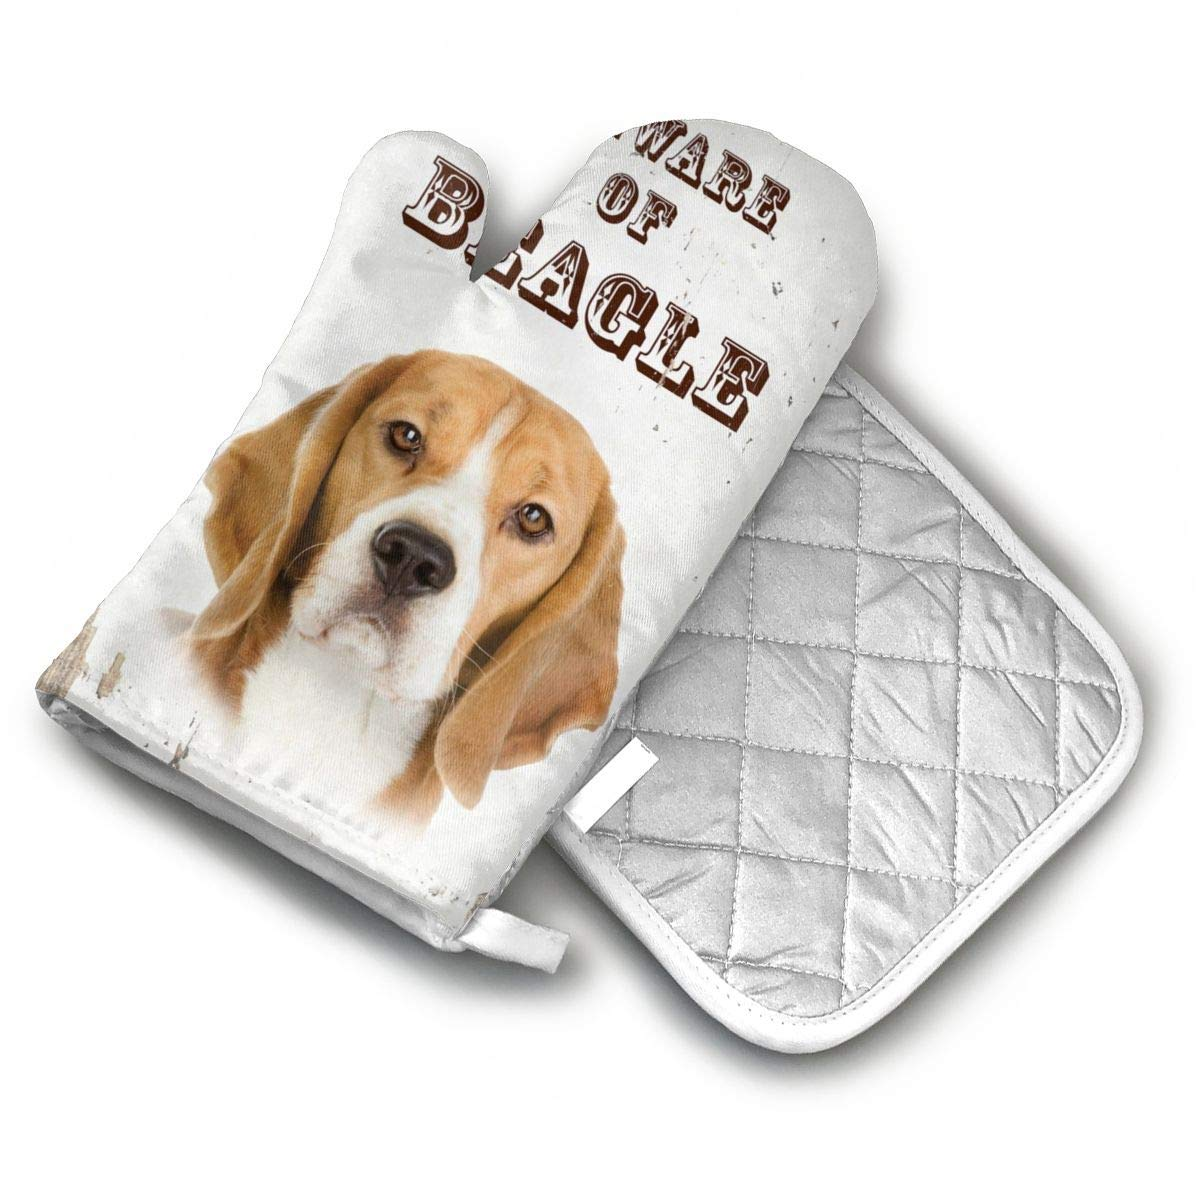 AISDHAJKSD Beware of Beagle Dog Premium Terylene/Nylon Oven Mitts and Pot Mat,Pot Mat/Hot Pads, Heat Resistant Gloves BBQ Kitchen